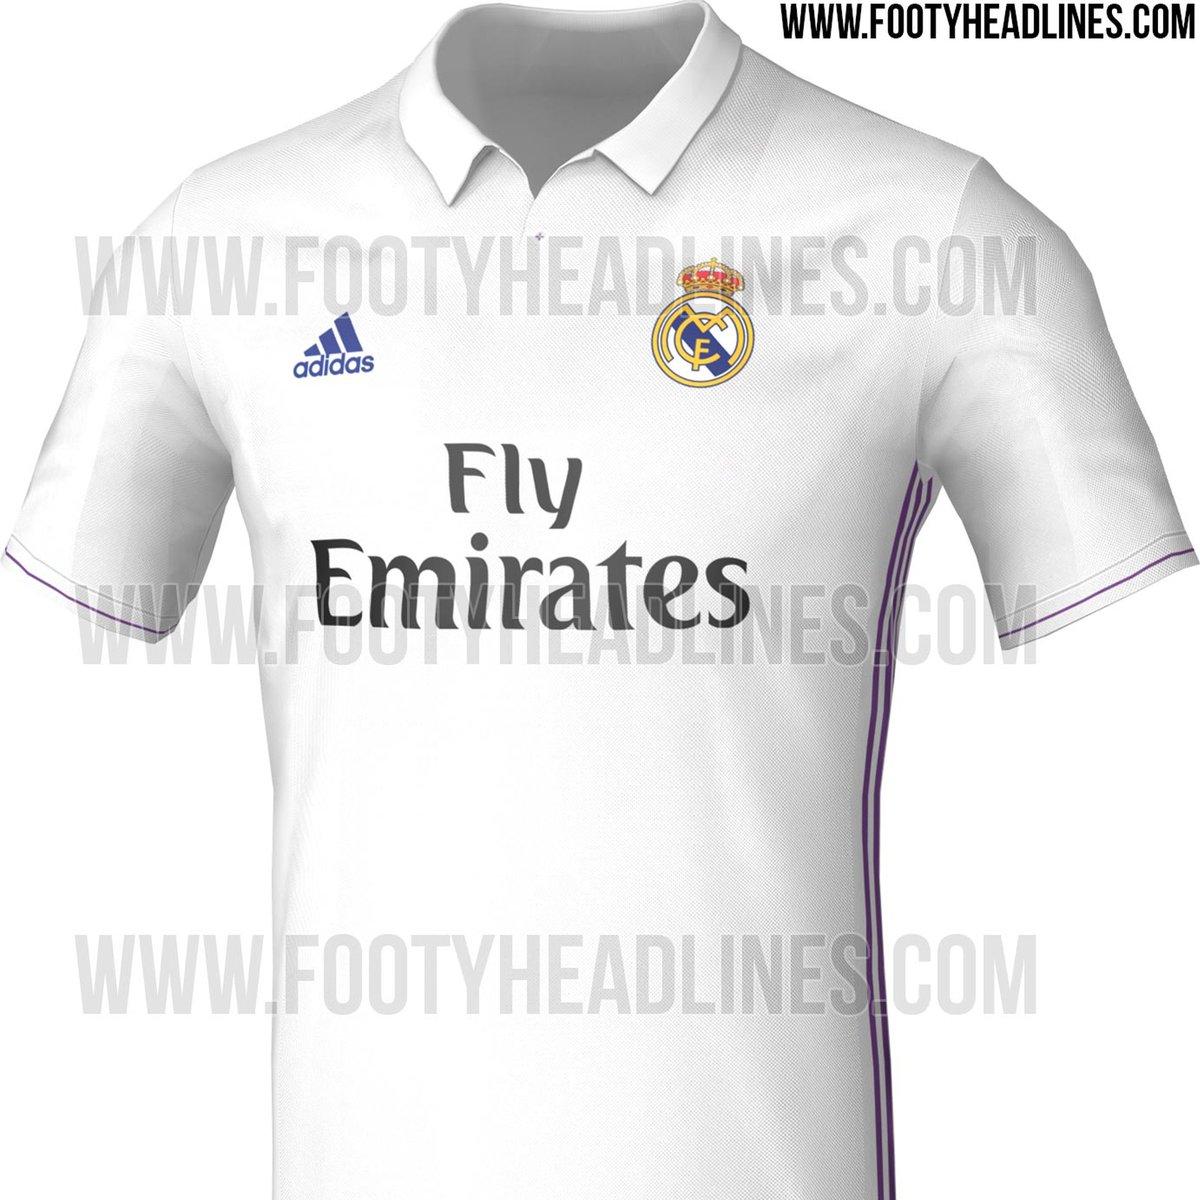 208d1b7afa0 The next  realmadrid home kit   footy headlines leak retro new white   purple  shirt